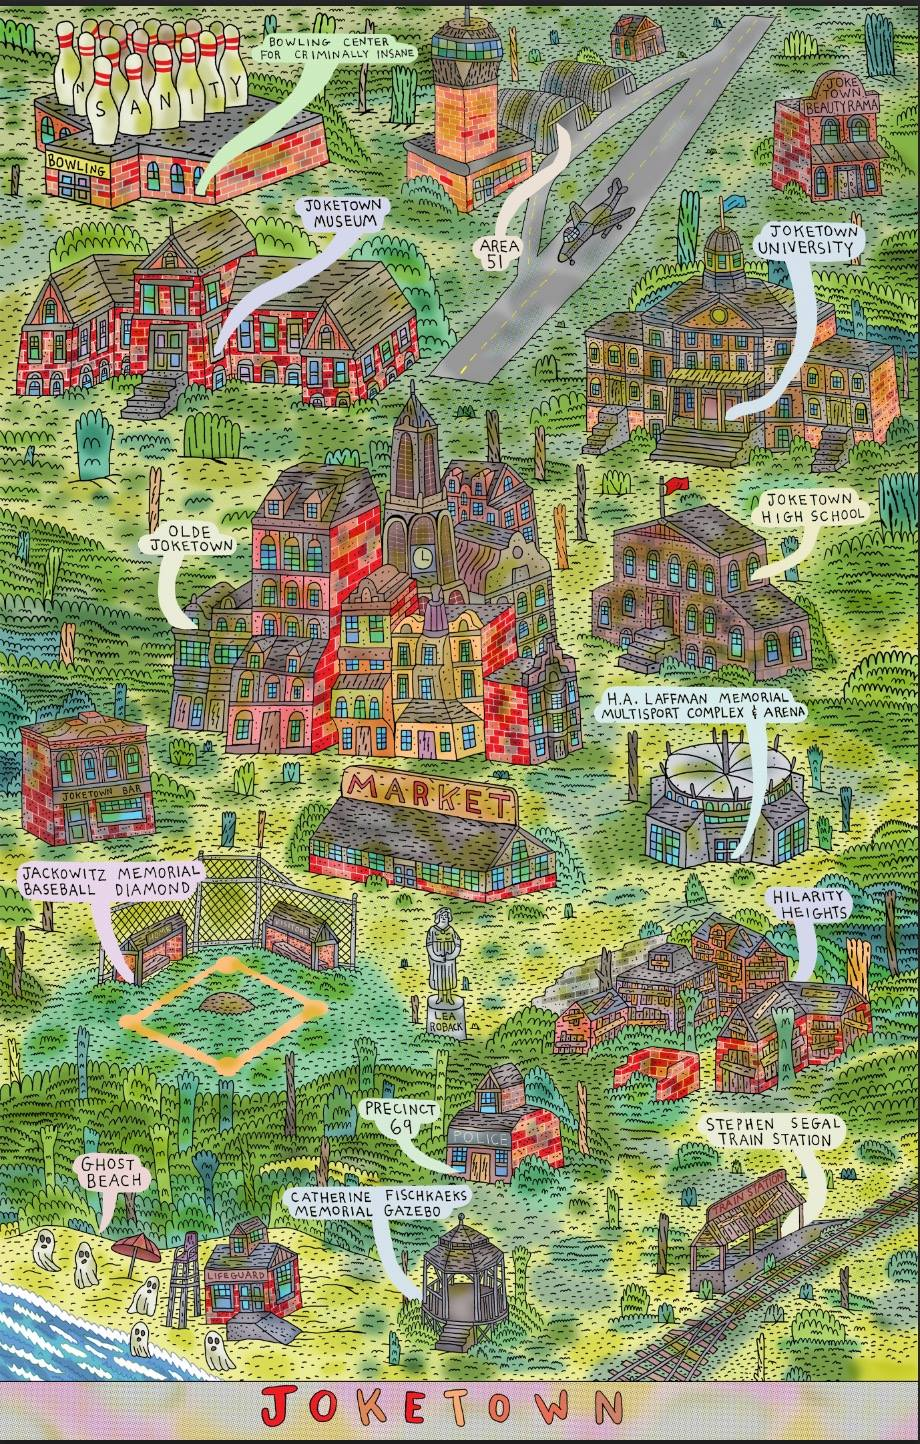 Keith Jones amazing map of Joketown.